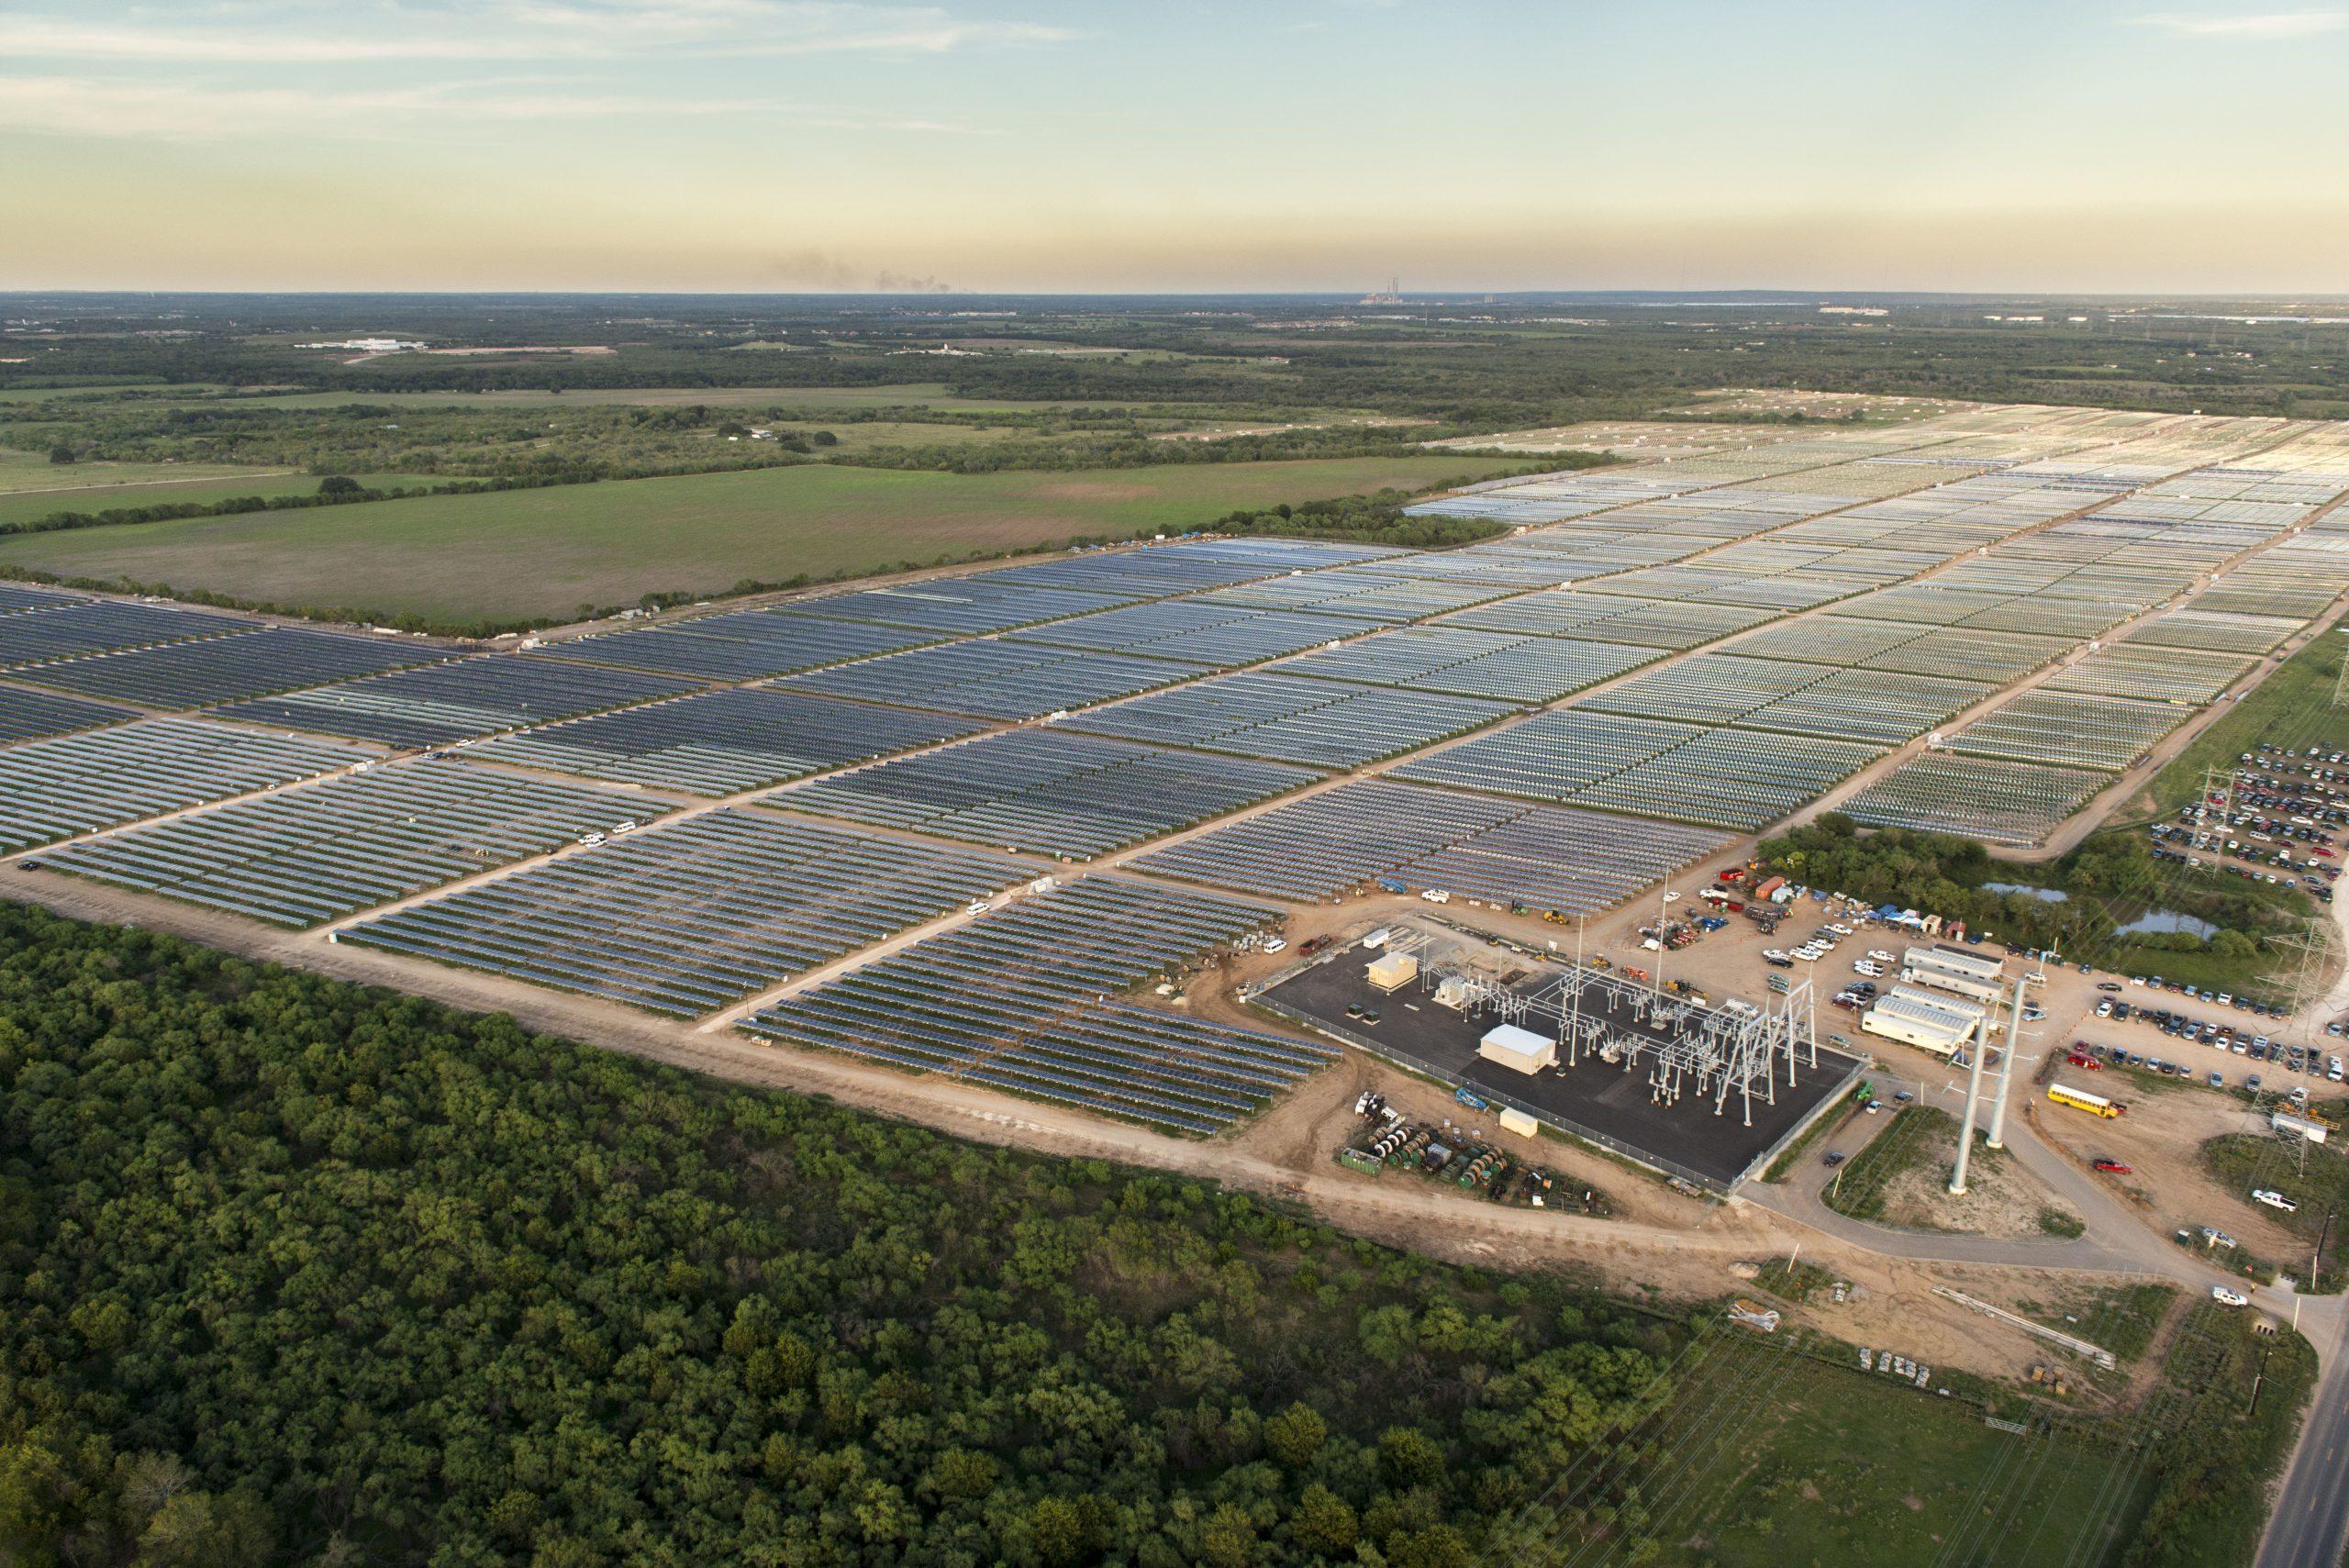 An aerial view of Alamo 1 solar farm located south of Loop 410 in San Antonio. Photo courtesy of OCI Solar Power.